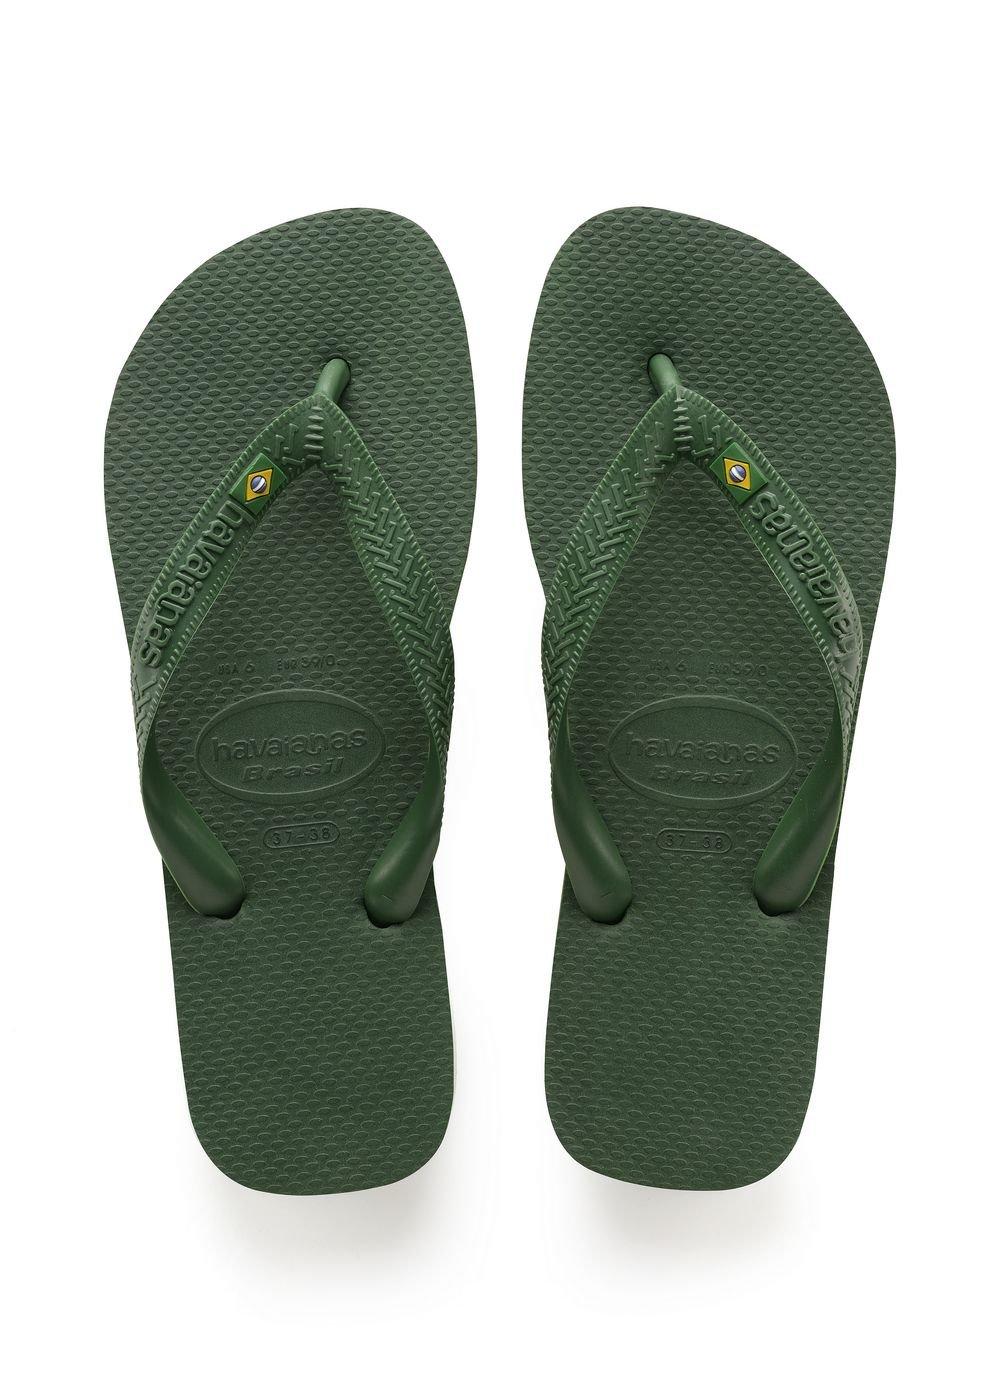 Havaianas Brasil, Unisex Adult's Flip Flops, Green (Brasil Amazonia), 3/4 UK (37/38EU) (35/36 BR) by Havaianas (Image #1)